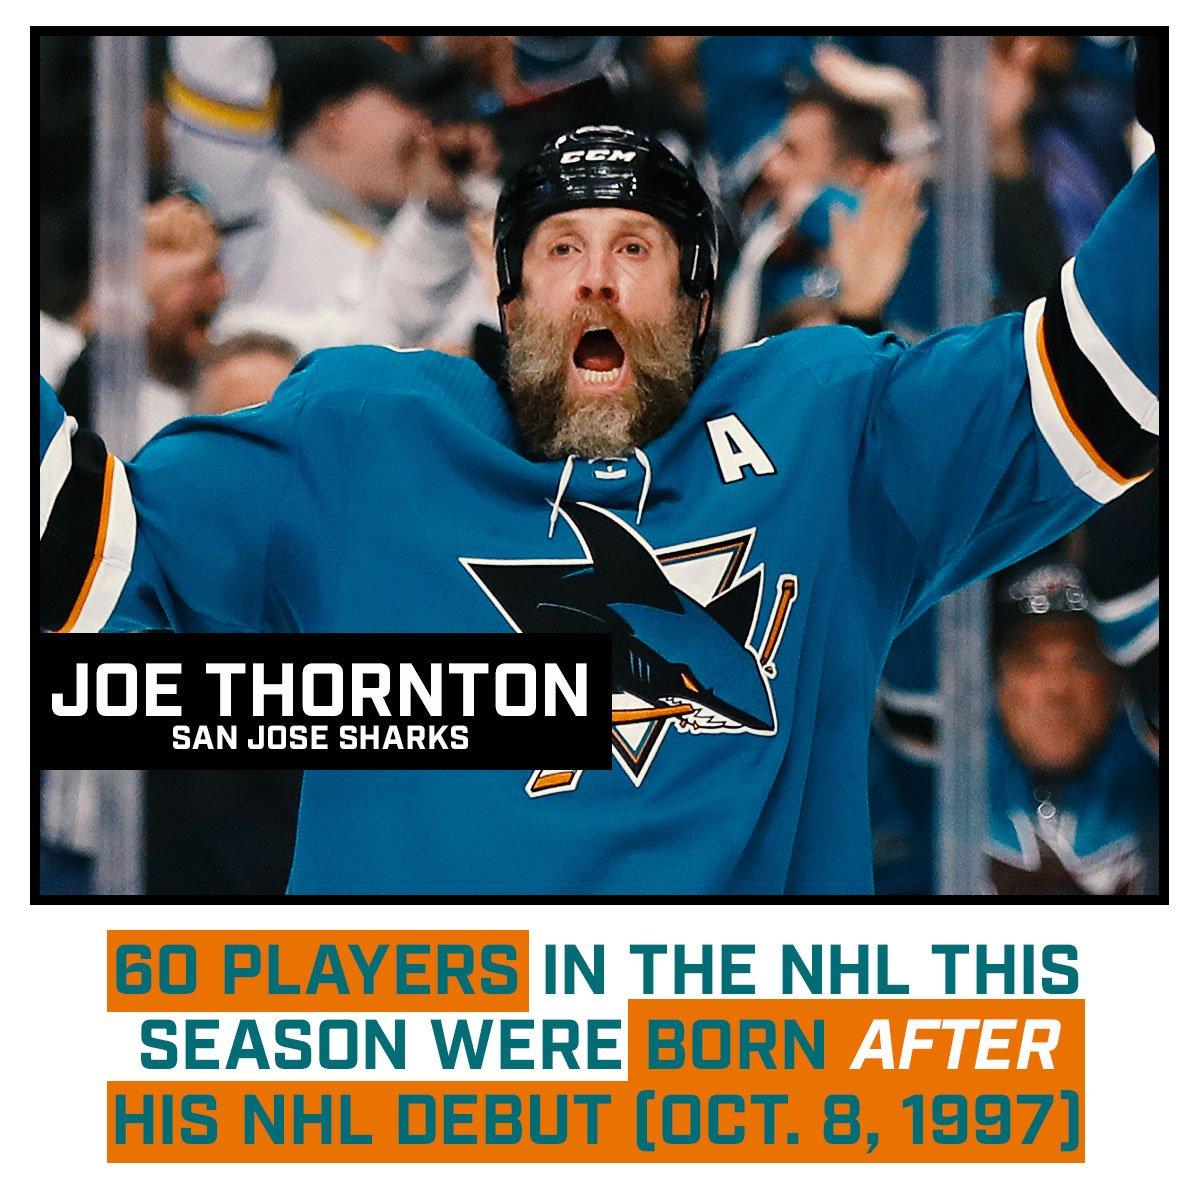 Can't stop won't stop Joe Thornton!